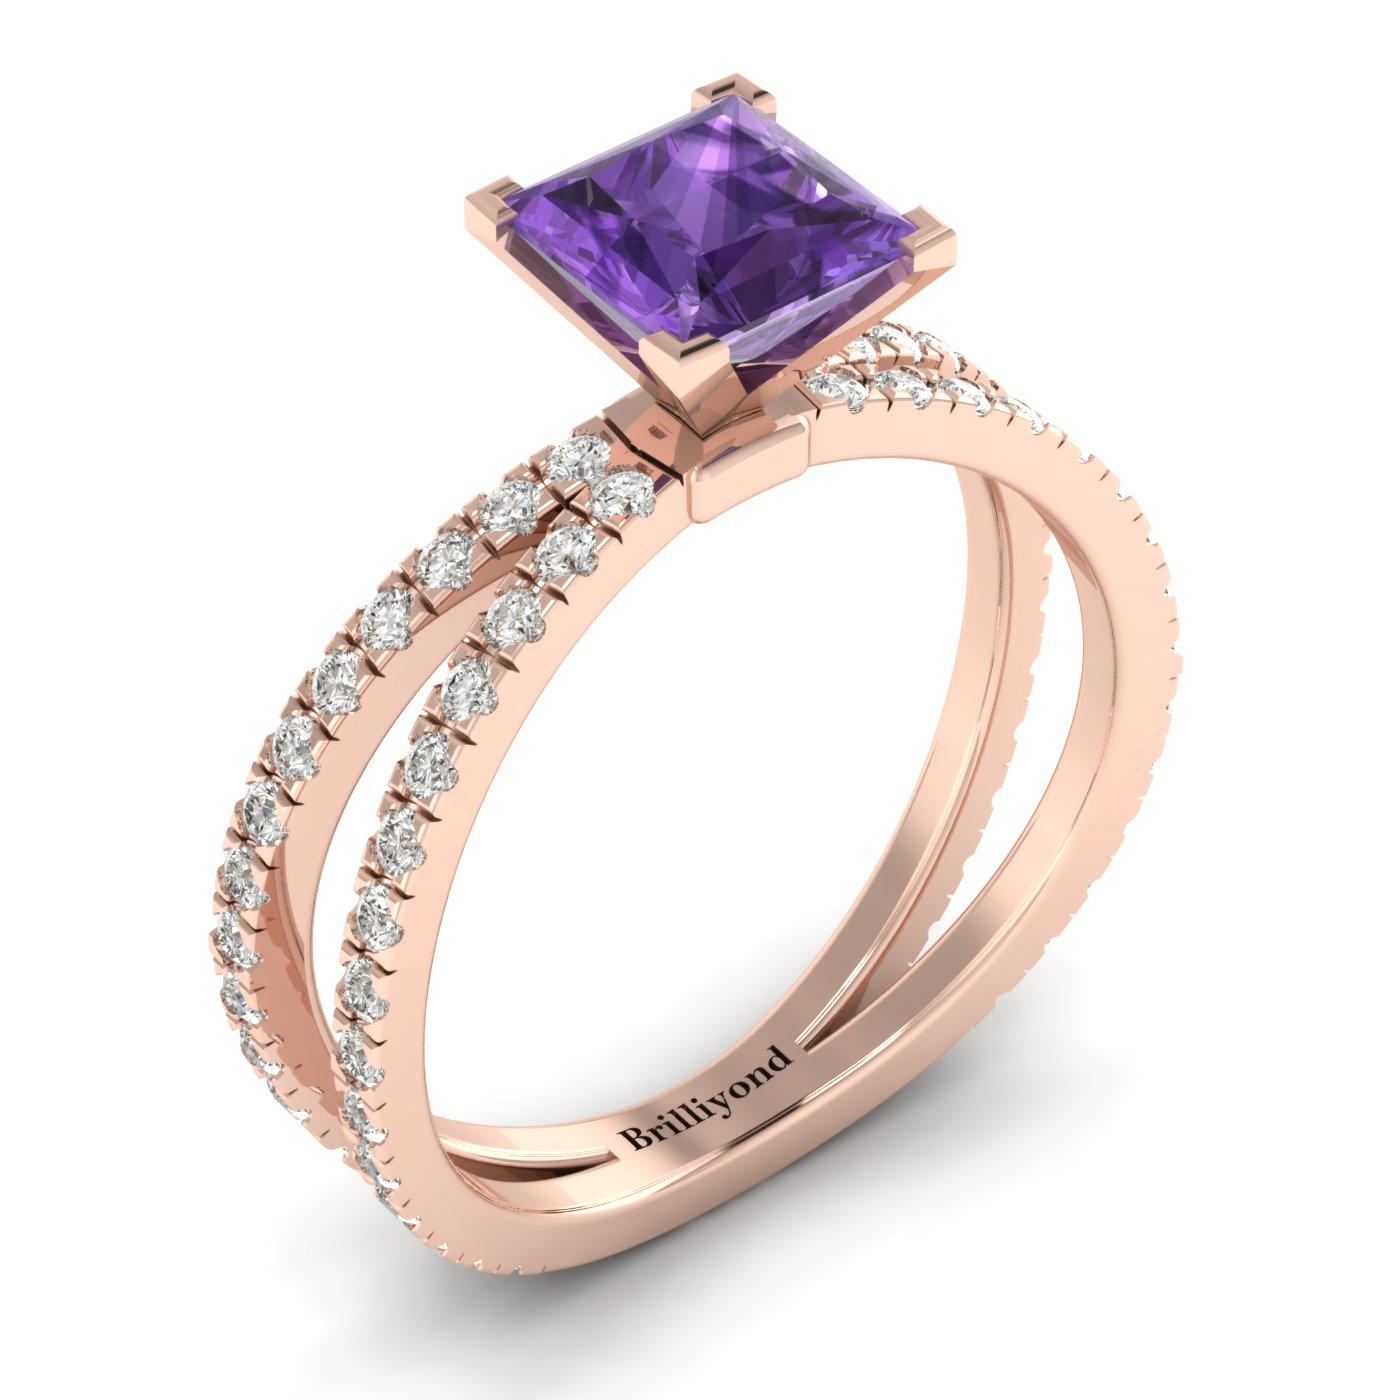 Amethyst Rose Gold Princess Cut Engagement Ring Florentine_image2